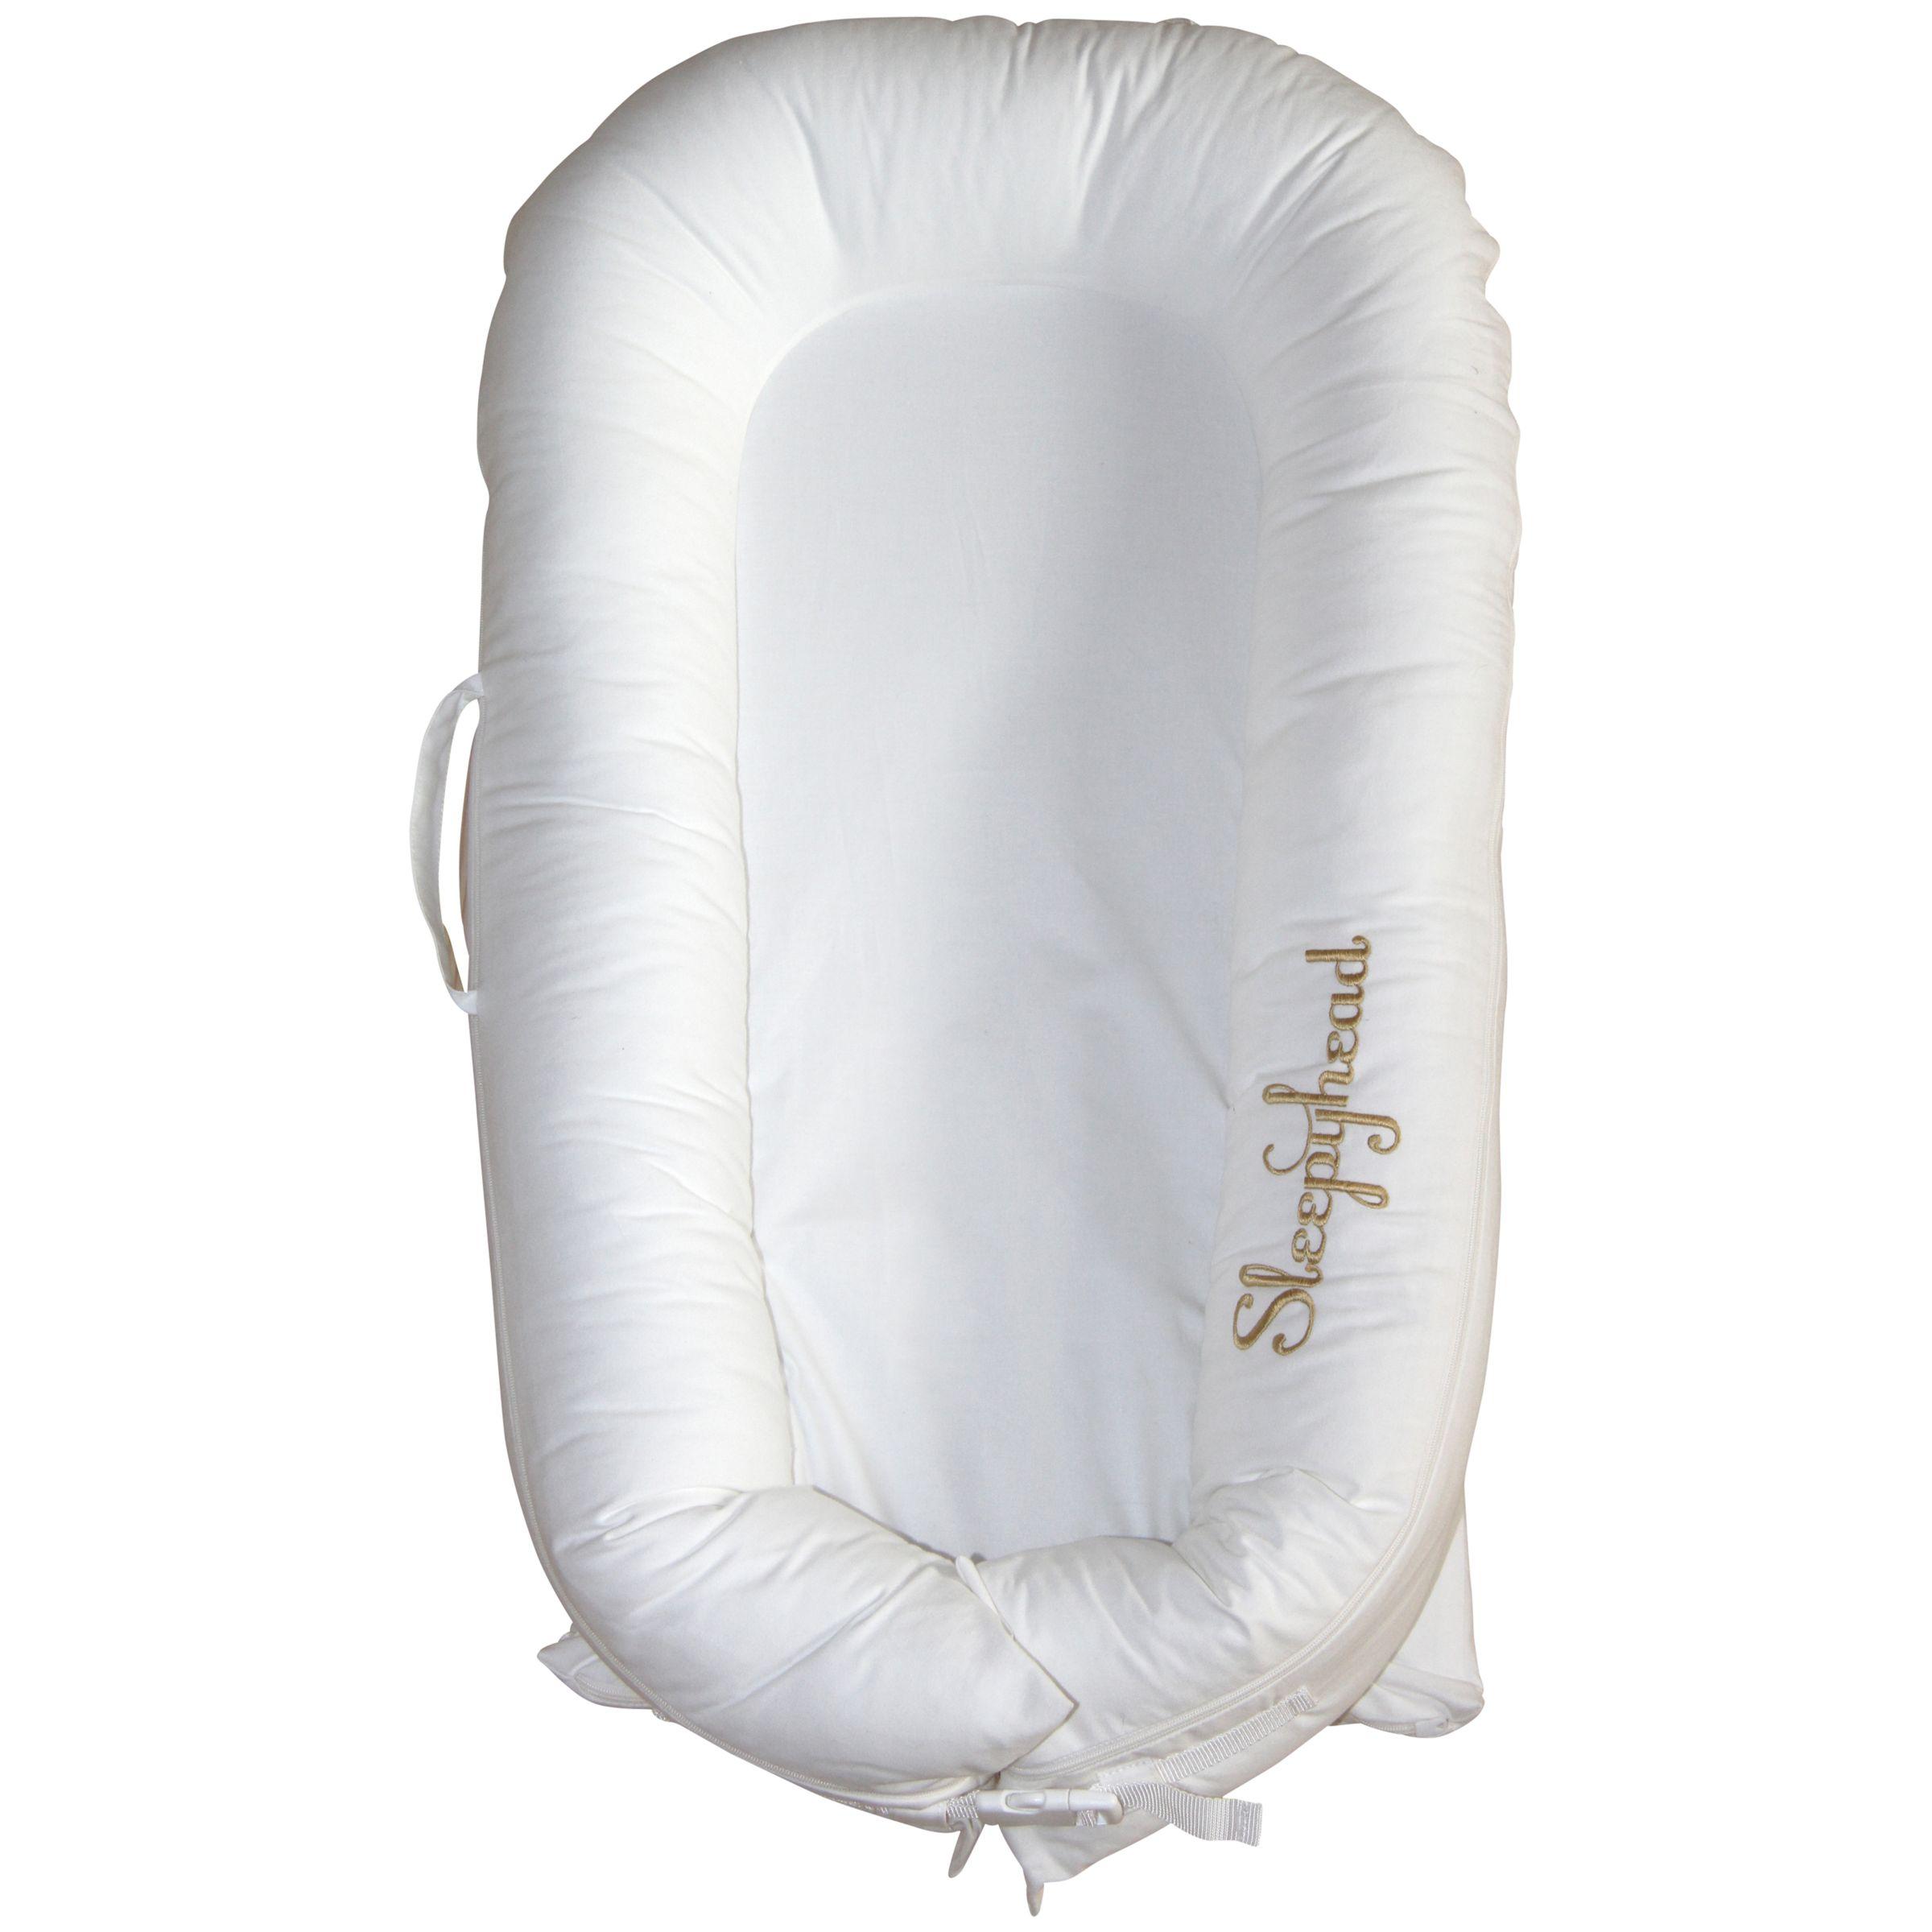 Sleepyhead Sleepyhead Deluxe Portable Baby Pod, White